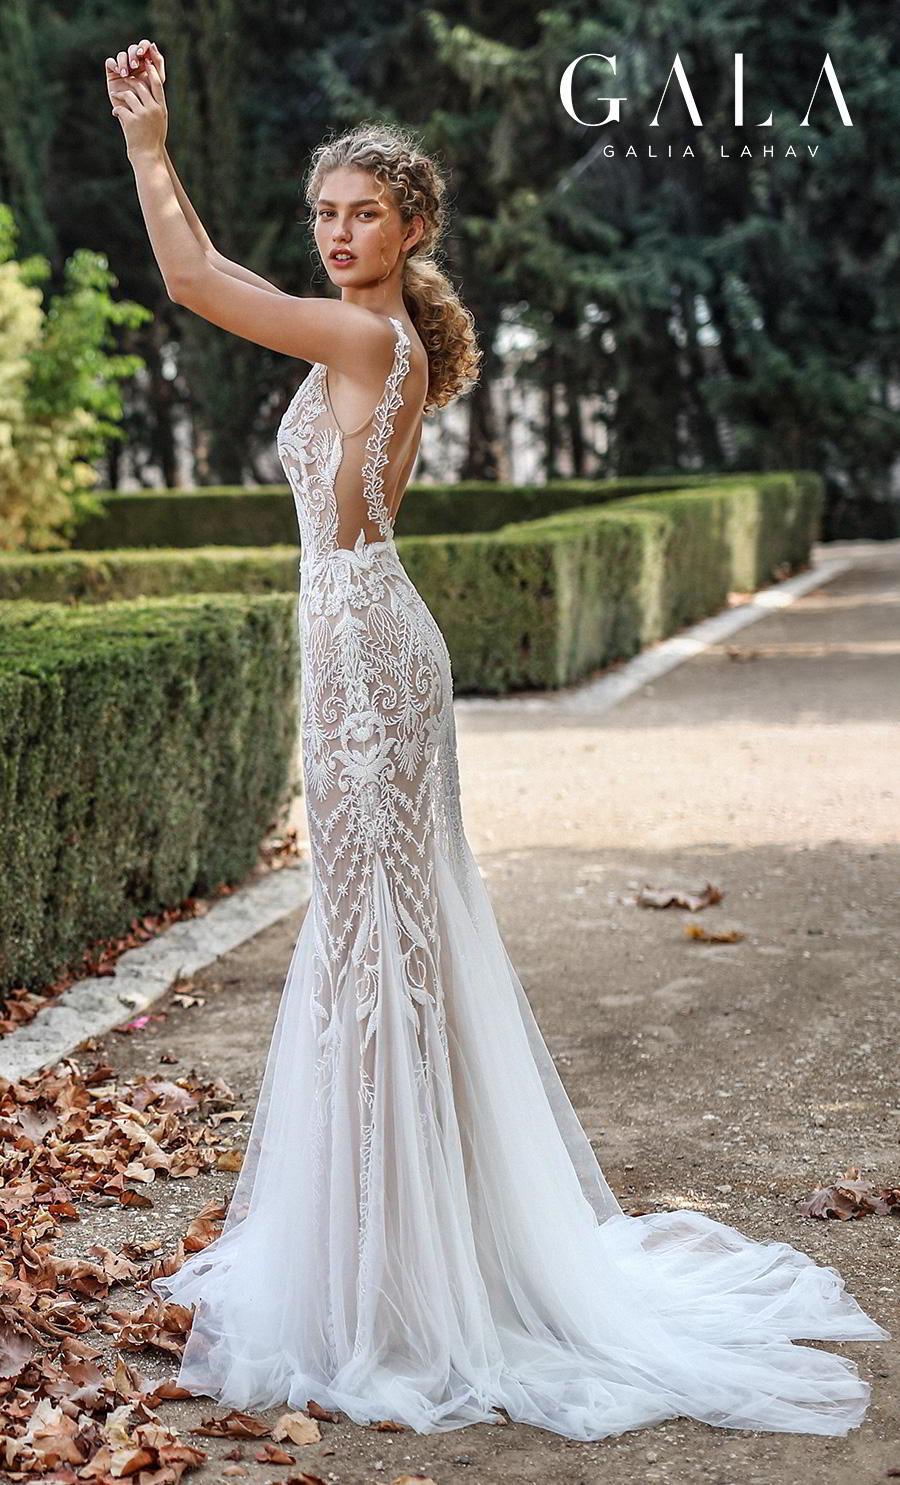 galia lahav gala fall 2019 bridal spaghetti strap deep plunging v neck full embellishment elegant glamorous lace fit and flare mermaid wedding dress backless scoop back medium train (212) sdv